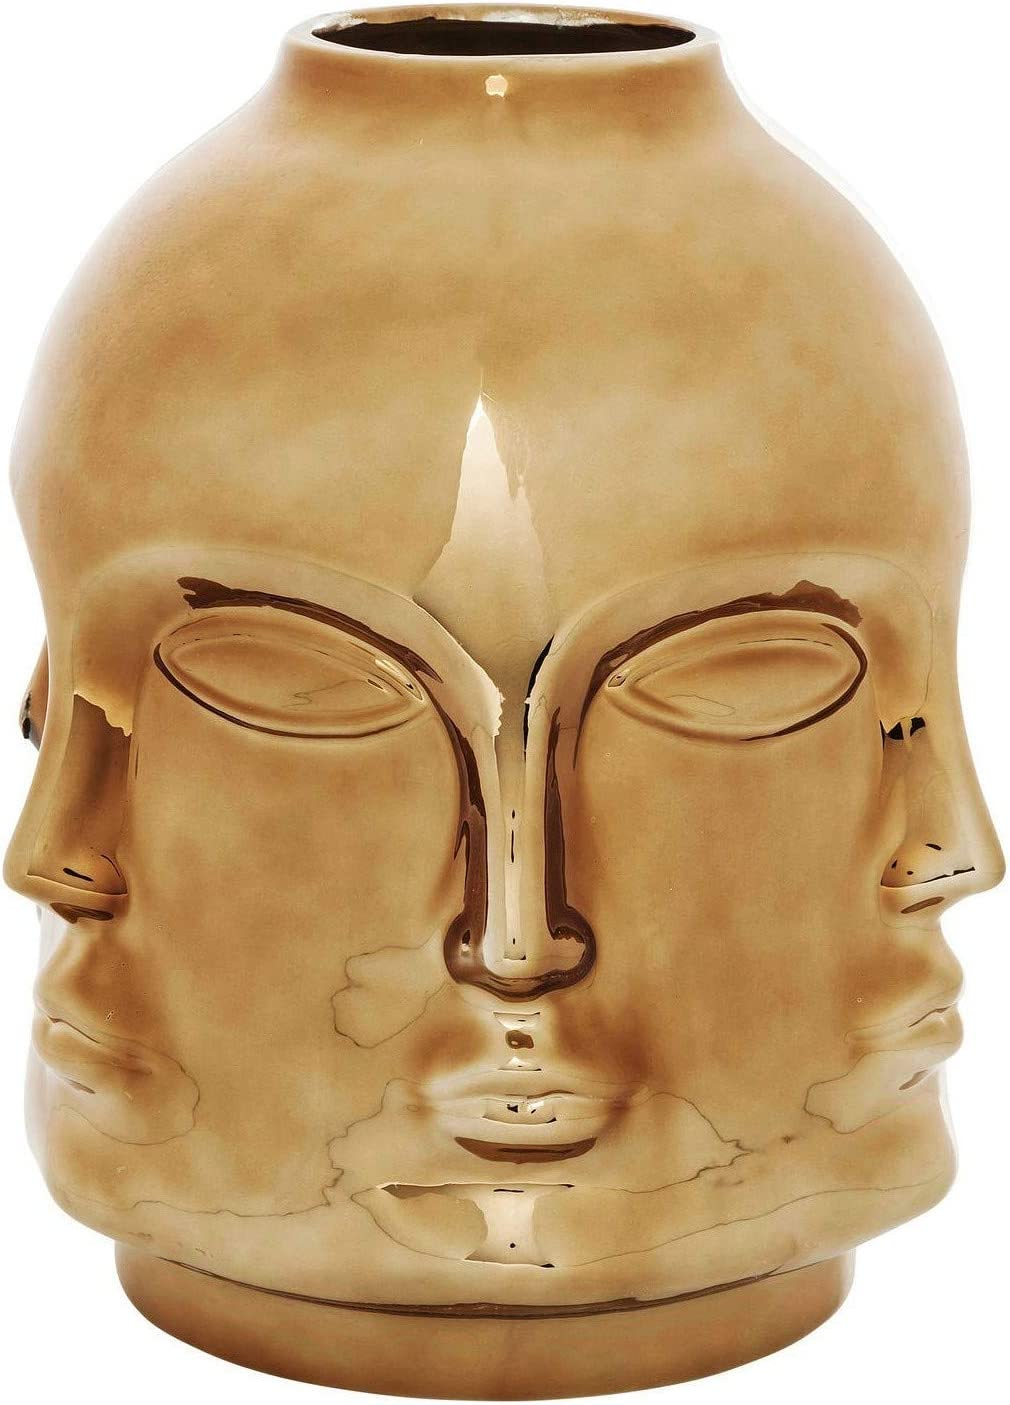 Kare Vase Rose Gold Faces Design Amazon Co Uk Kitchen Home